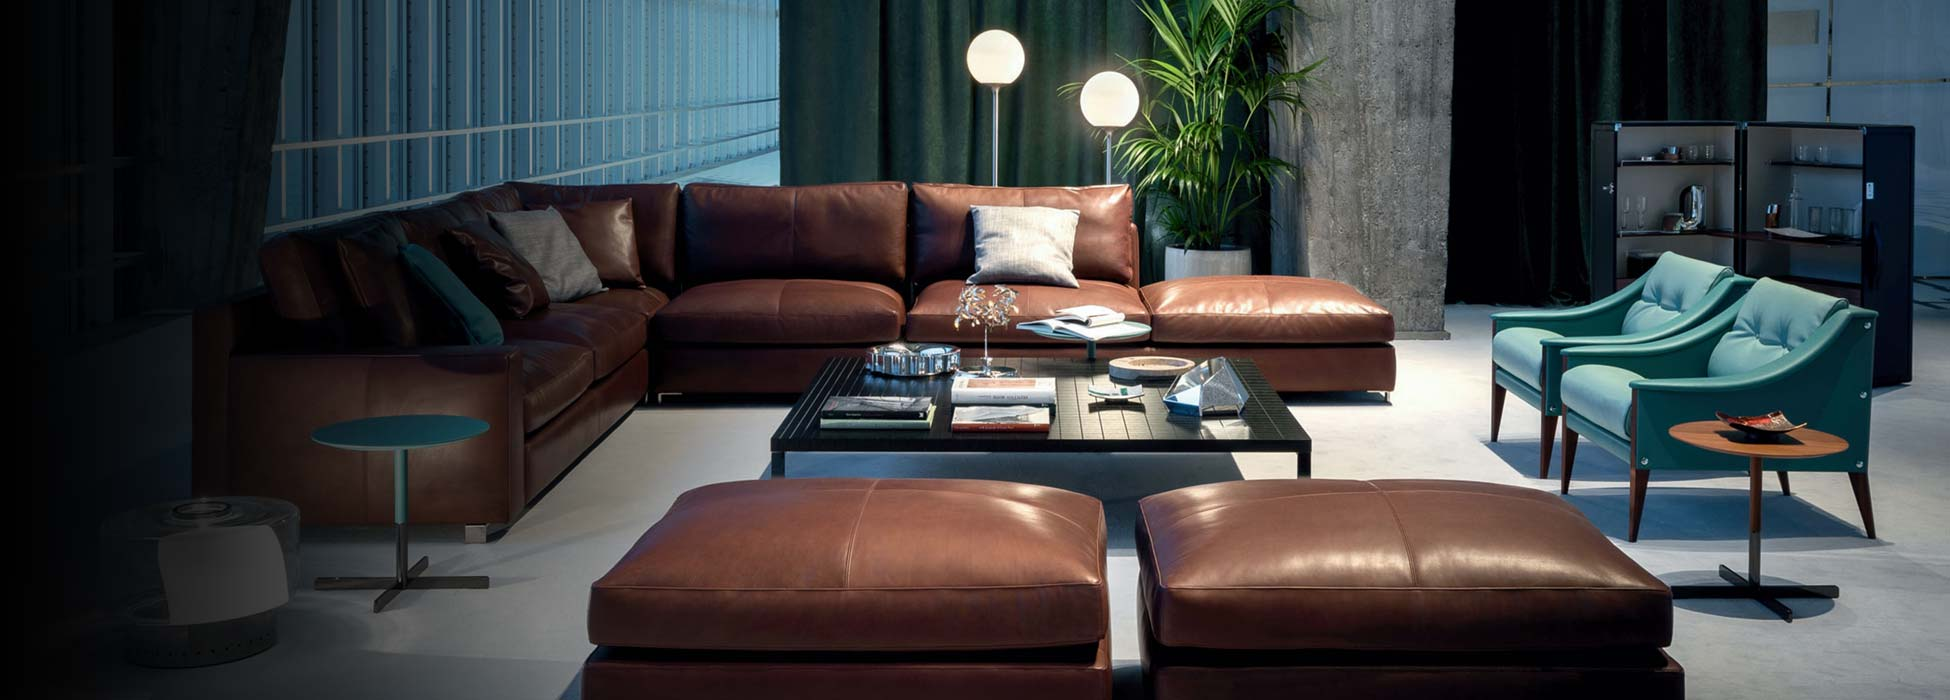 poltrona frau massimosistema sofa bei steidten+ berlin